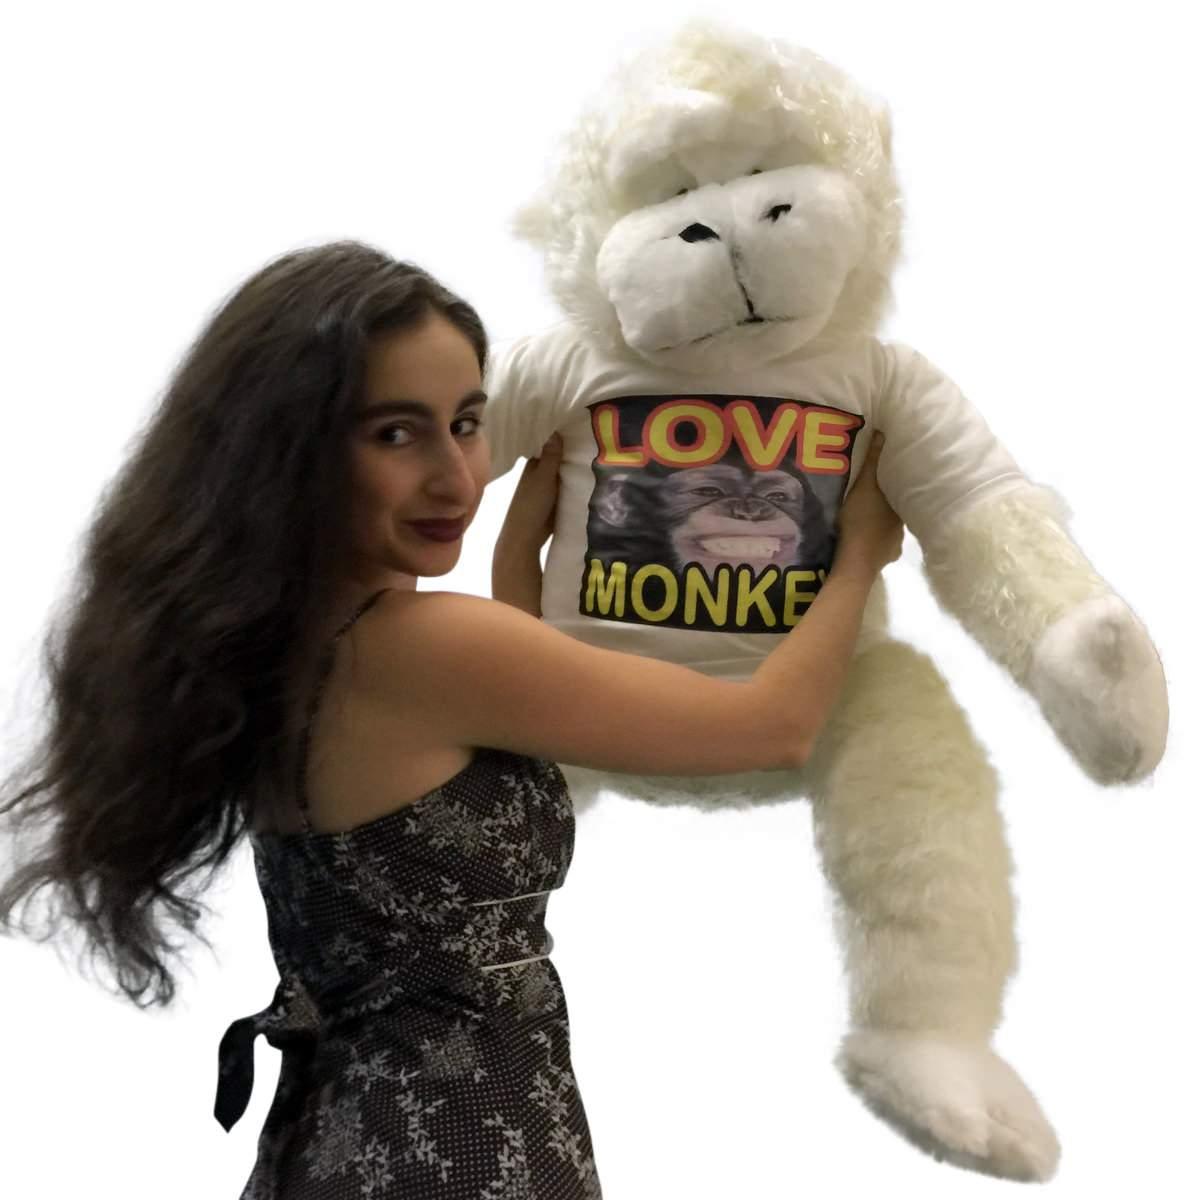 American Made Jumbo Stuffed White Gorilla Wearing Love Monkey T